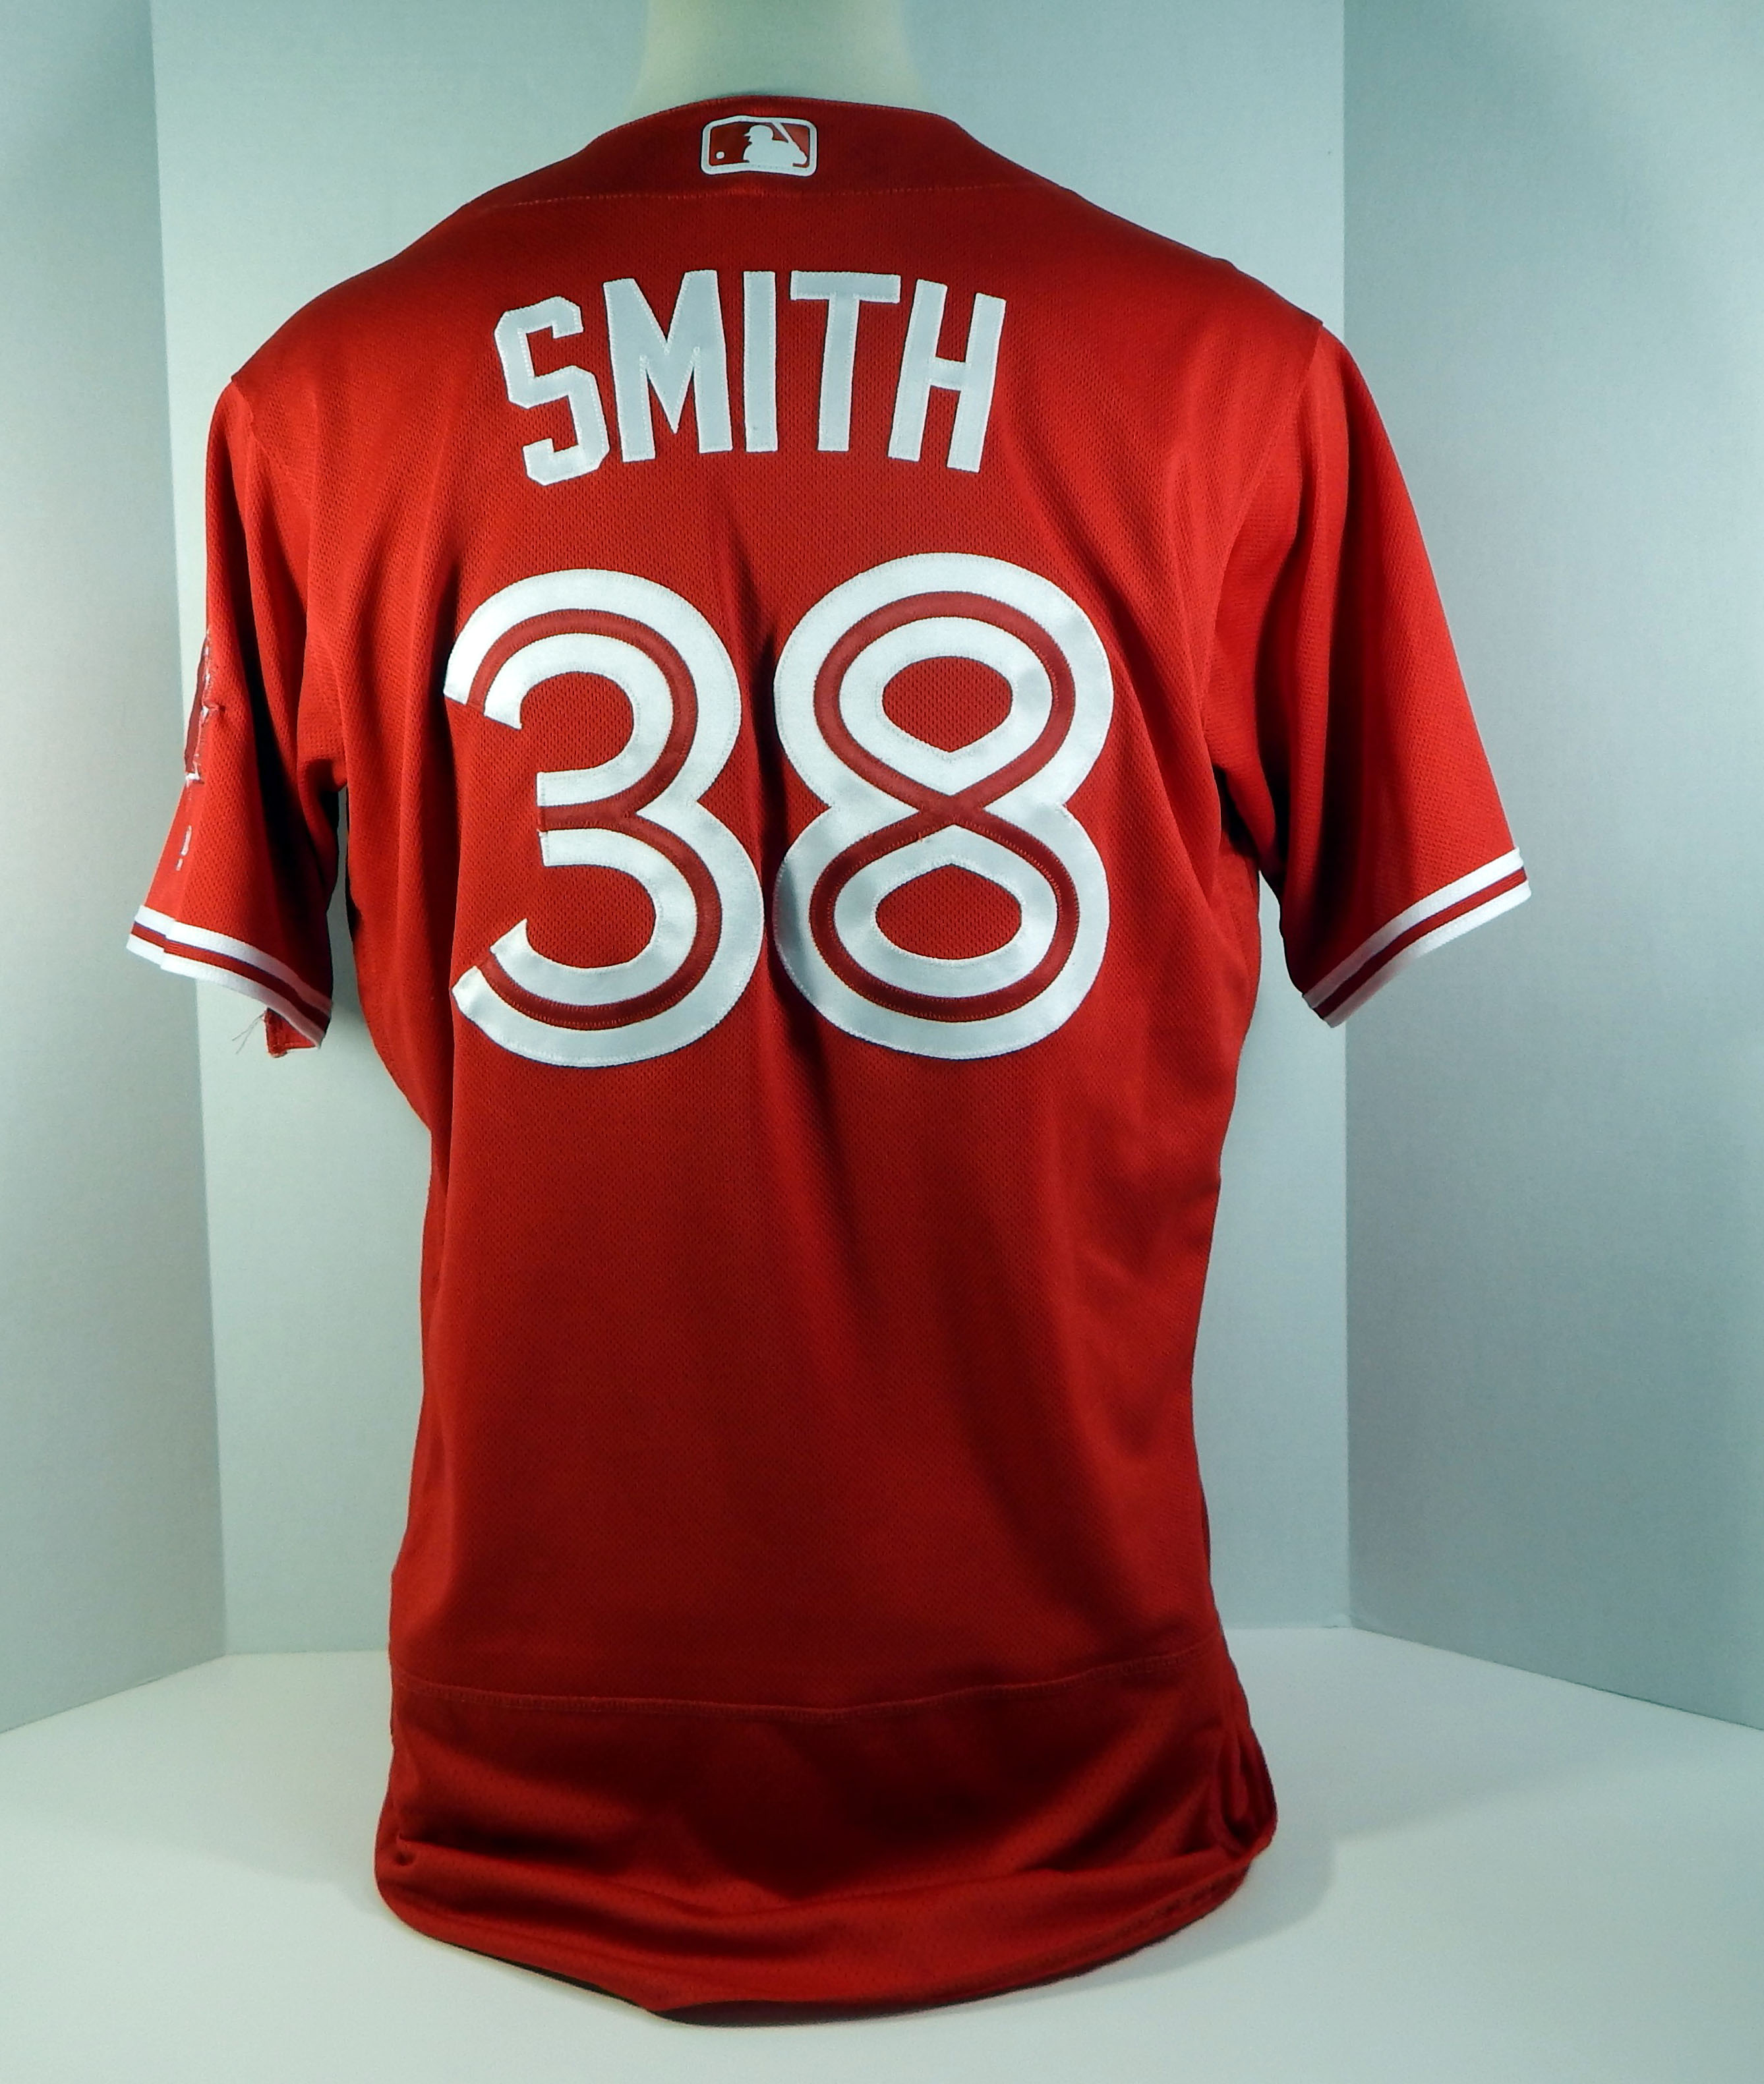 1bfa659c4 2017 Toronto Blue Jays Joe Smith  38 Game Used Red Canada Day Jersey ...